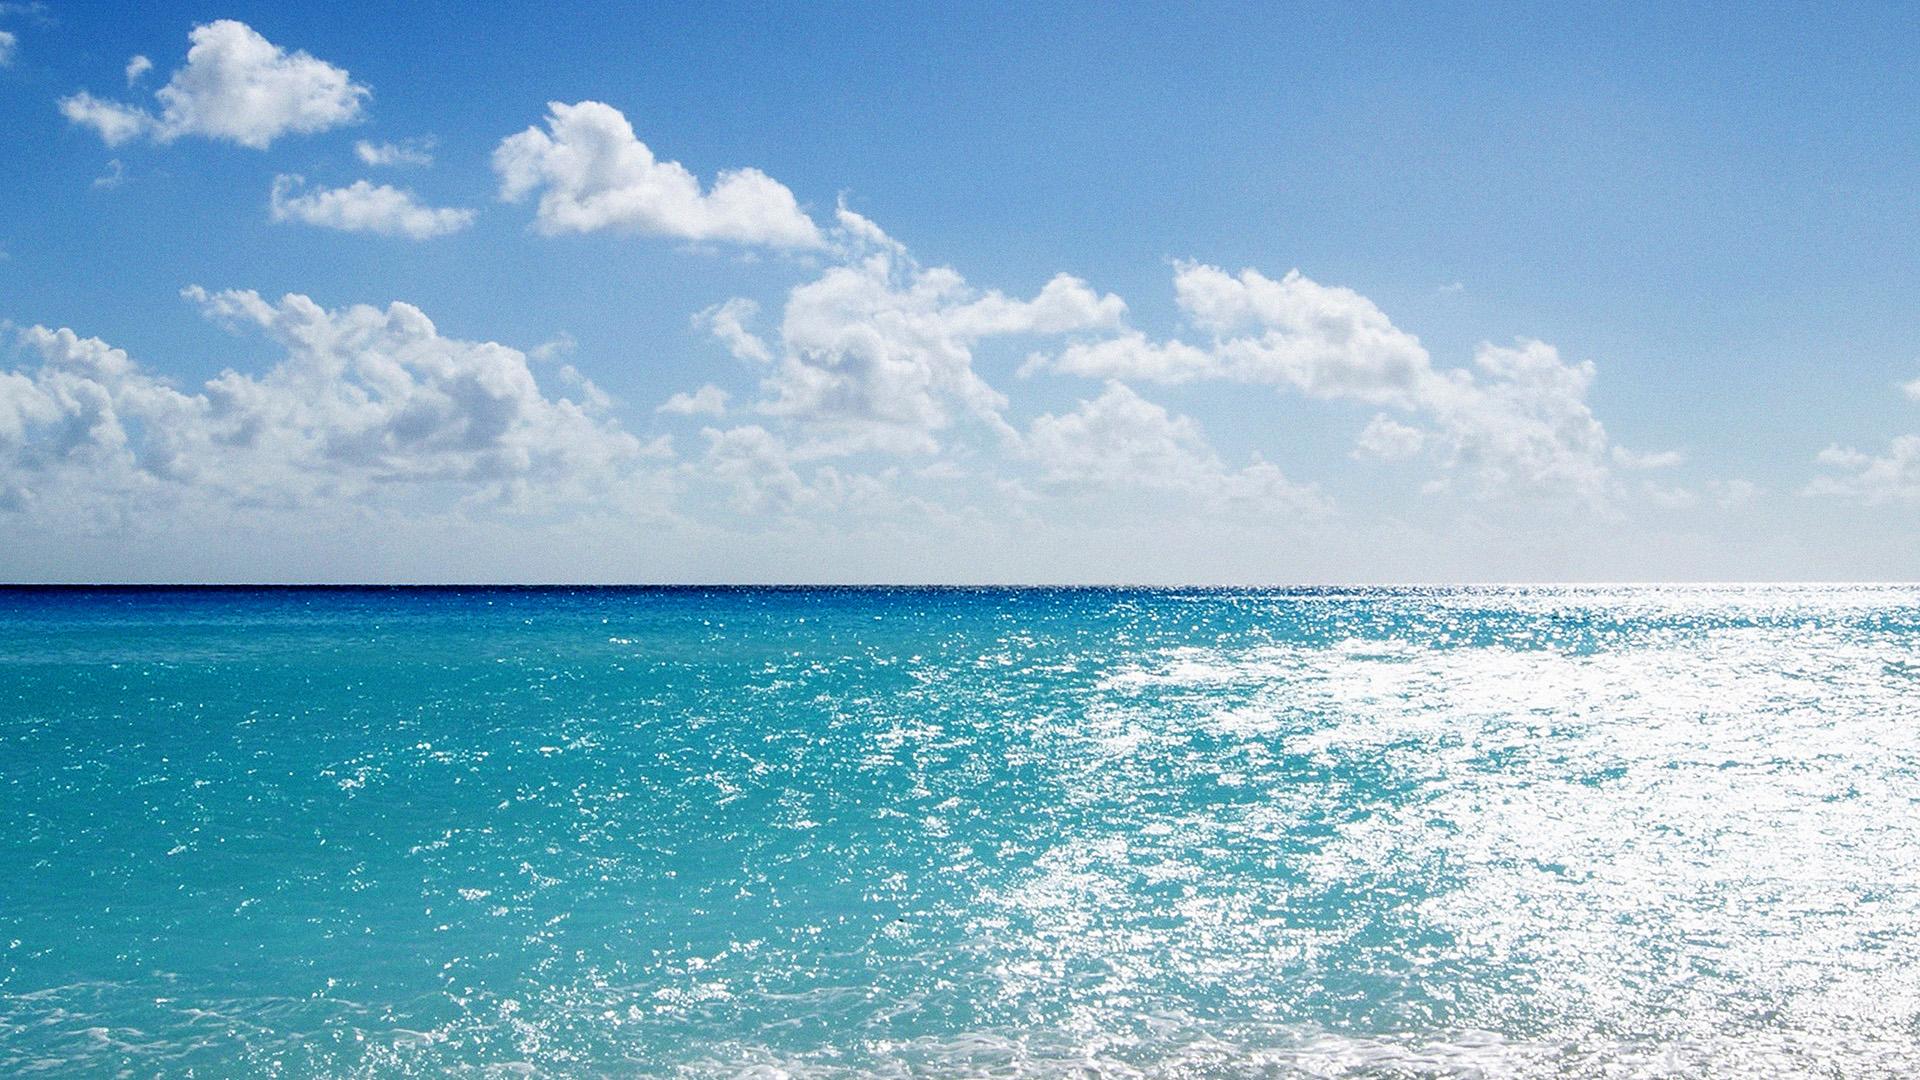 Beautiful Fall Wallpapers For Desktop Mj67 Sea Water Ocean Sky Sunny Nature Papers Co